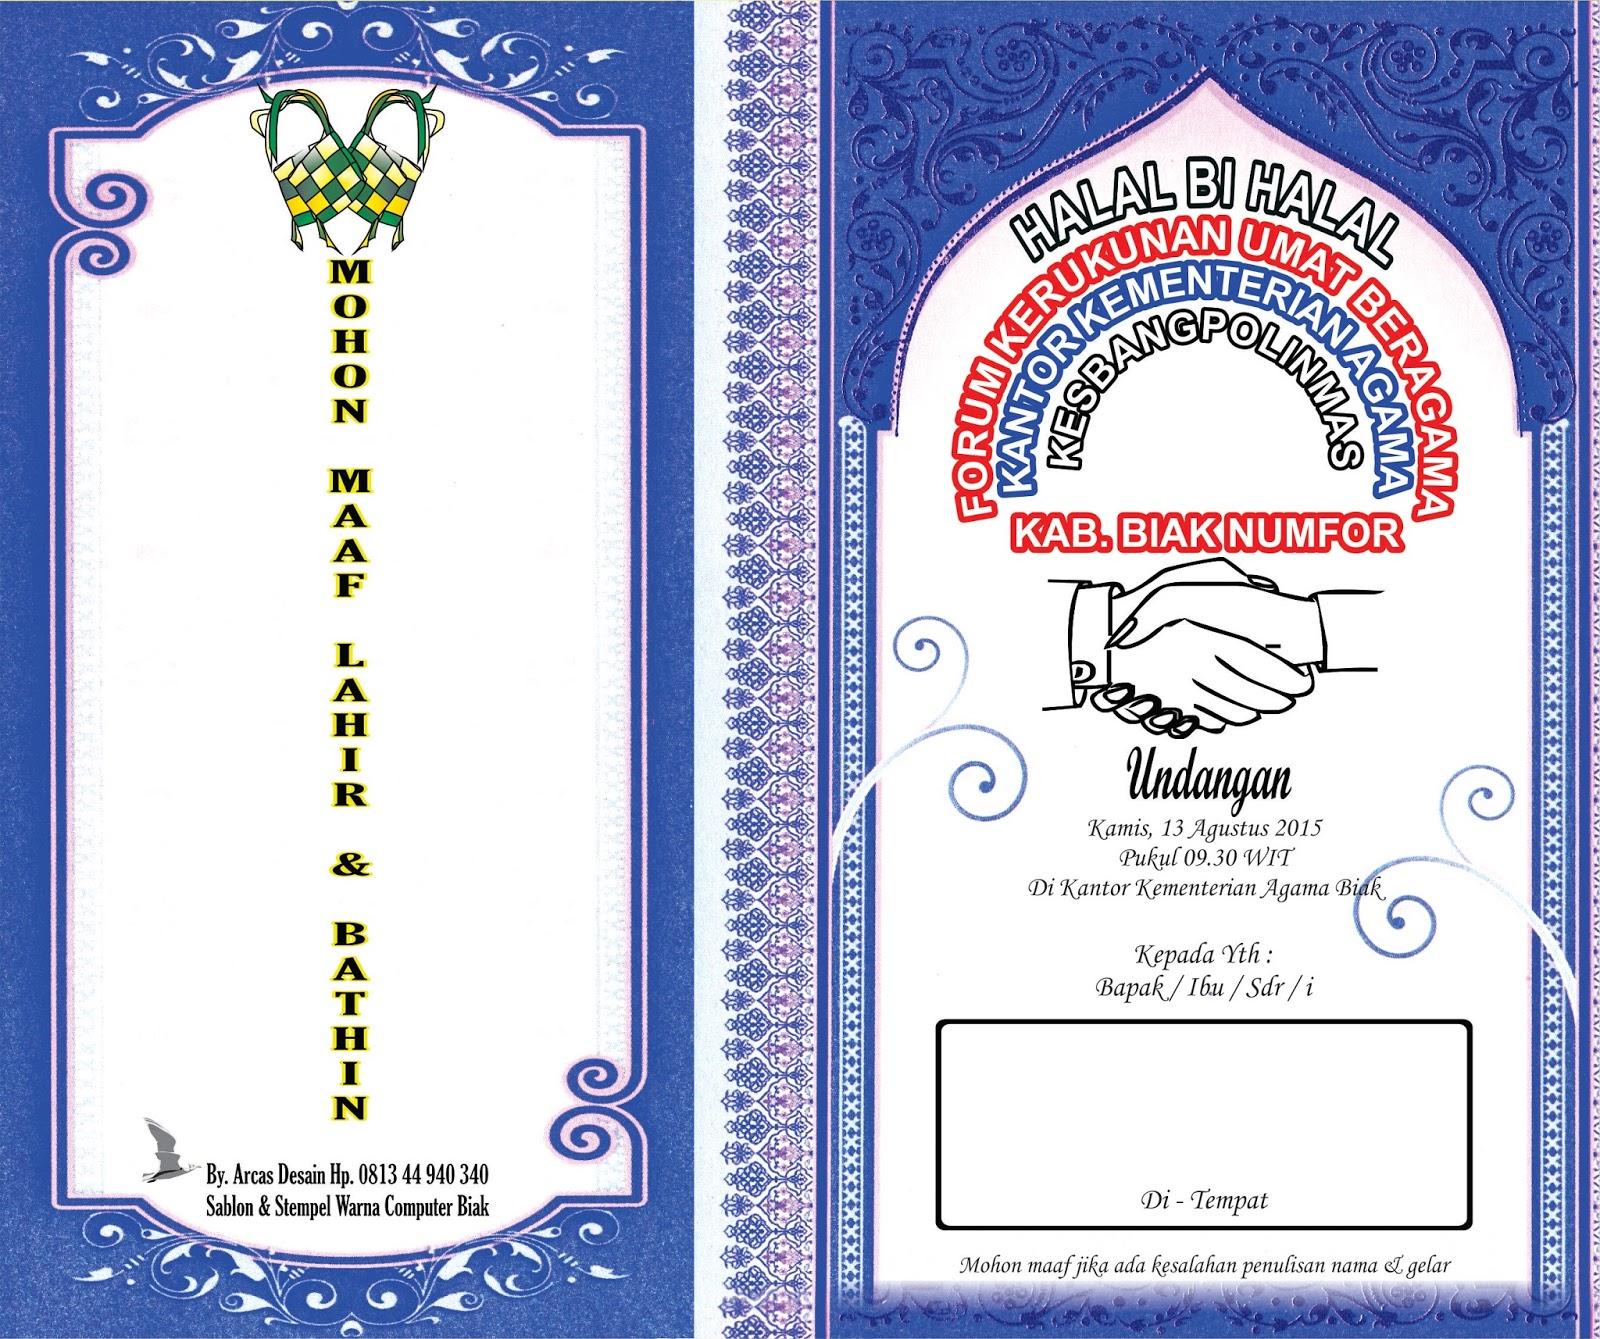 Kumpulan Undangan Halal Bi Halal Format Cdr Download Gratis